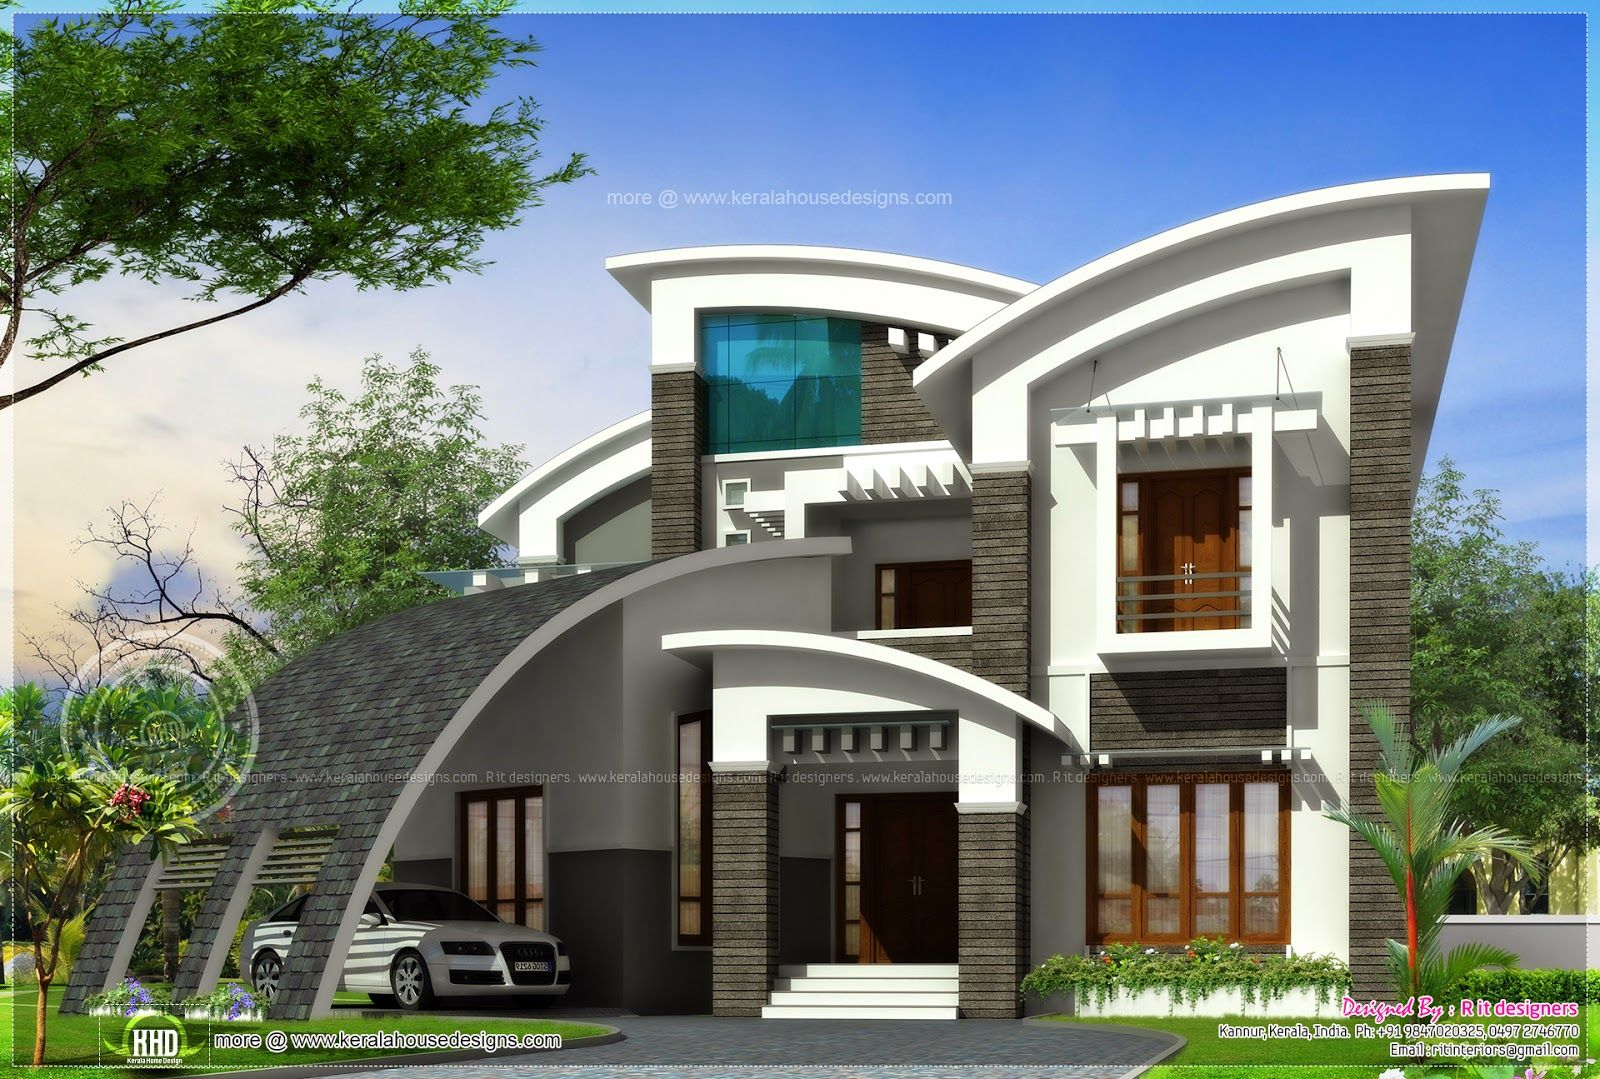 Wonderful Luxury Ultra Modern Homes => https://smsmls.com/16416 ...